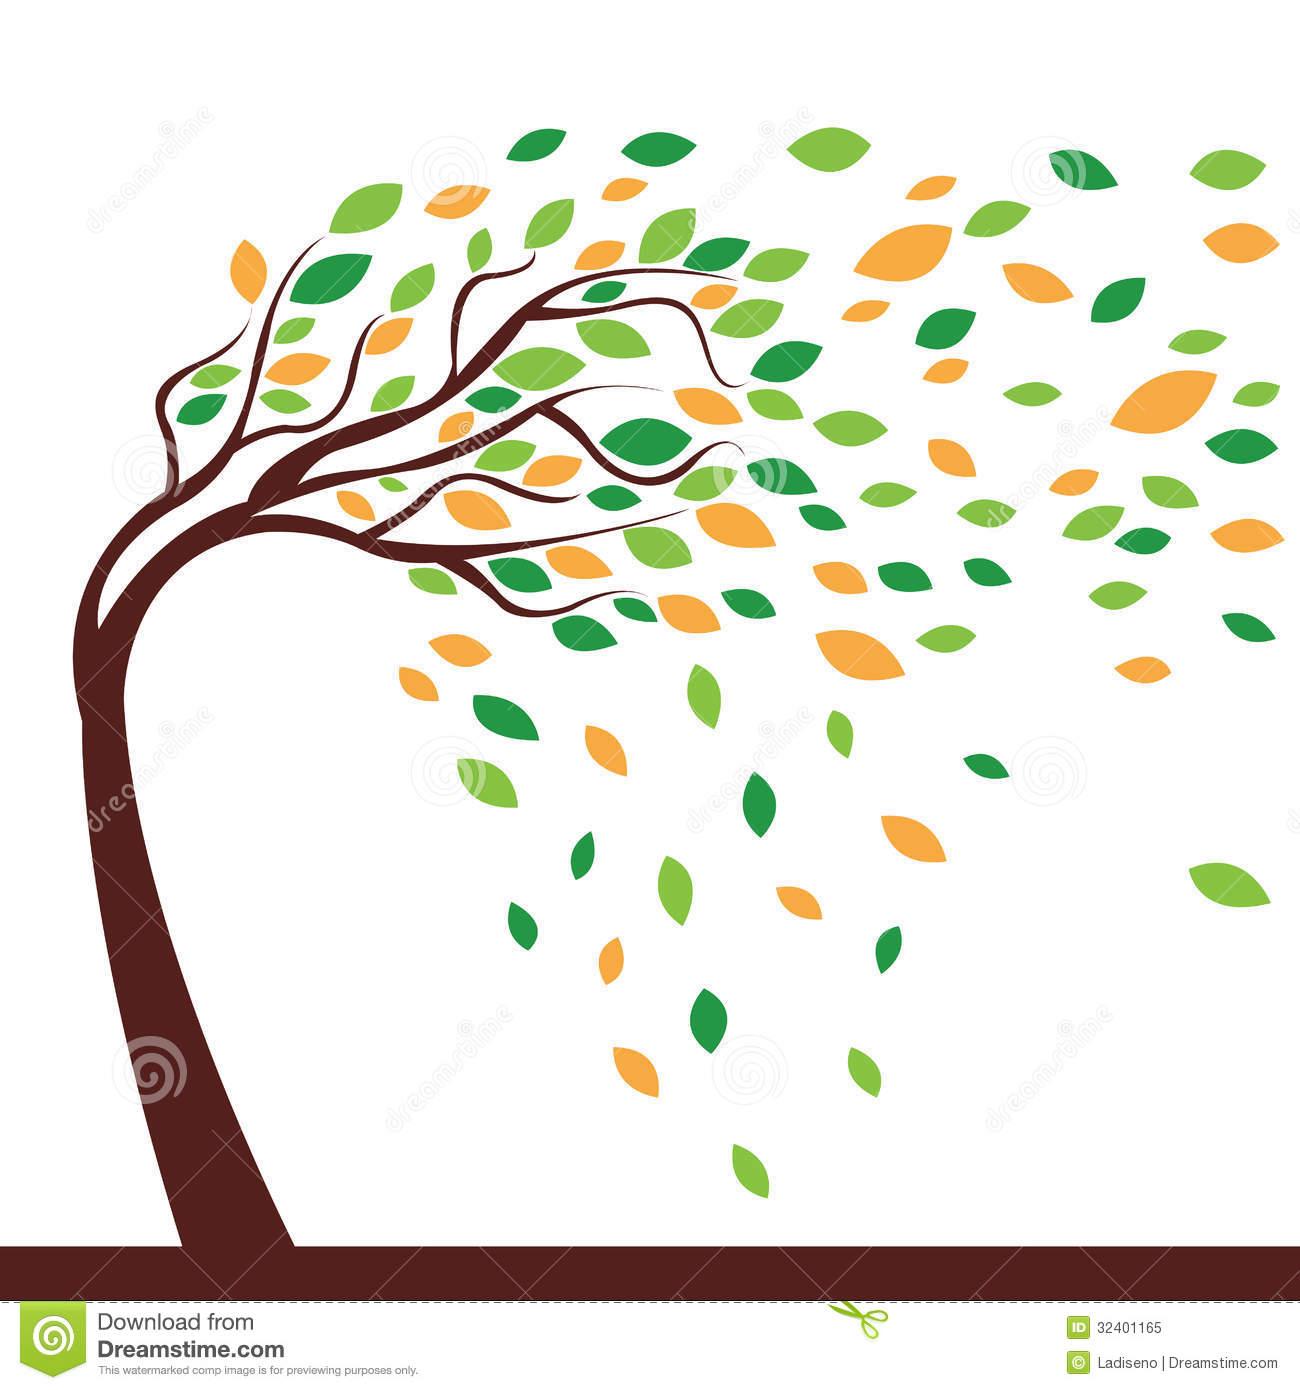 Bent trees clipart #9